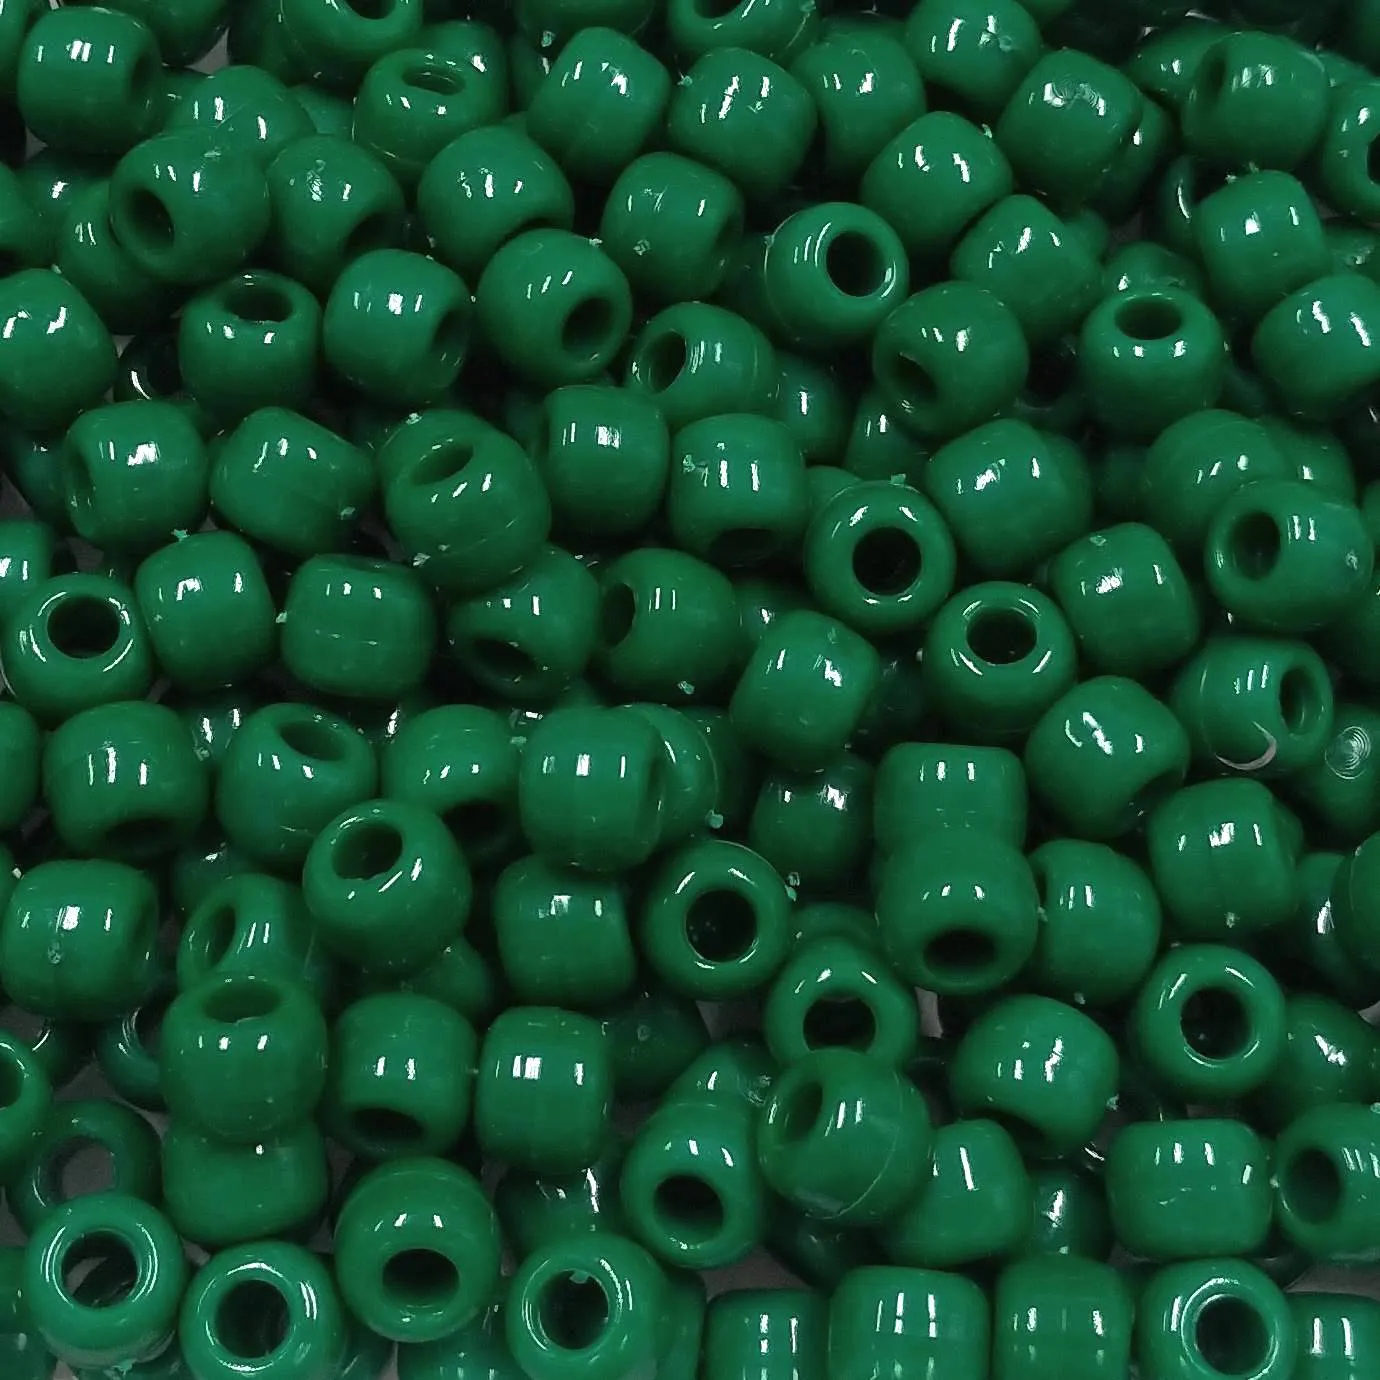 Miçanga Tererê 10mm - Cores Leitosas - 500g